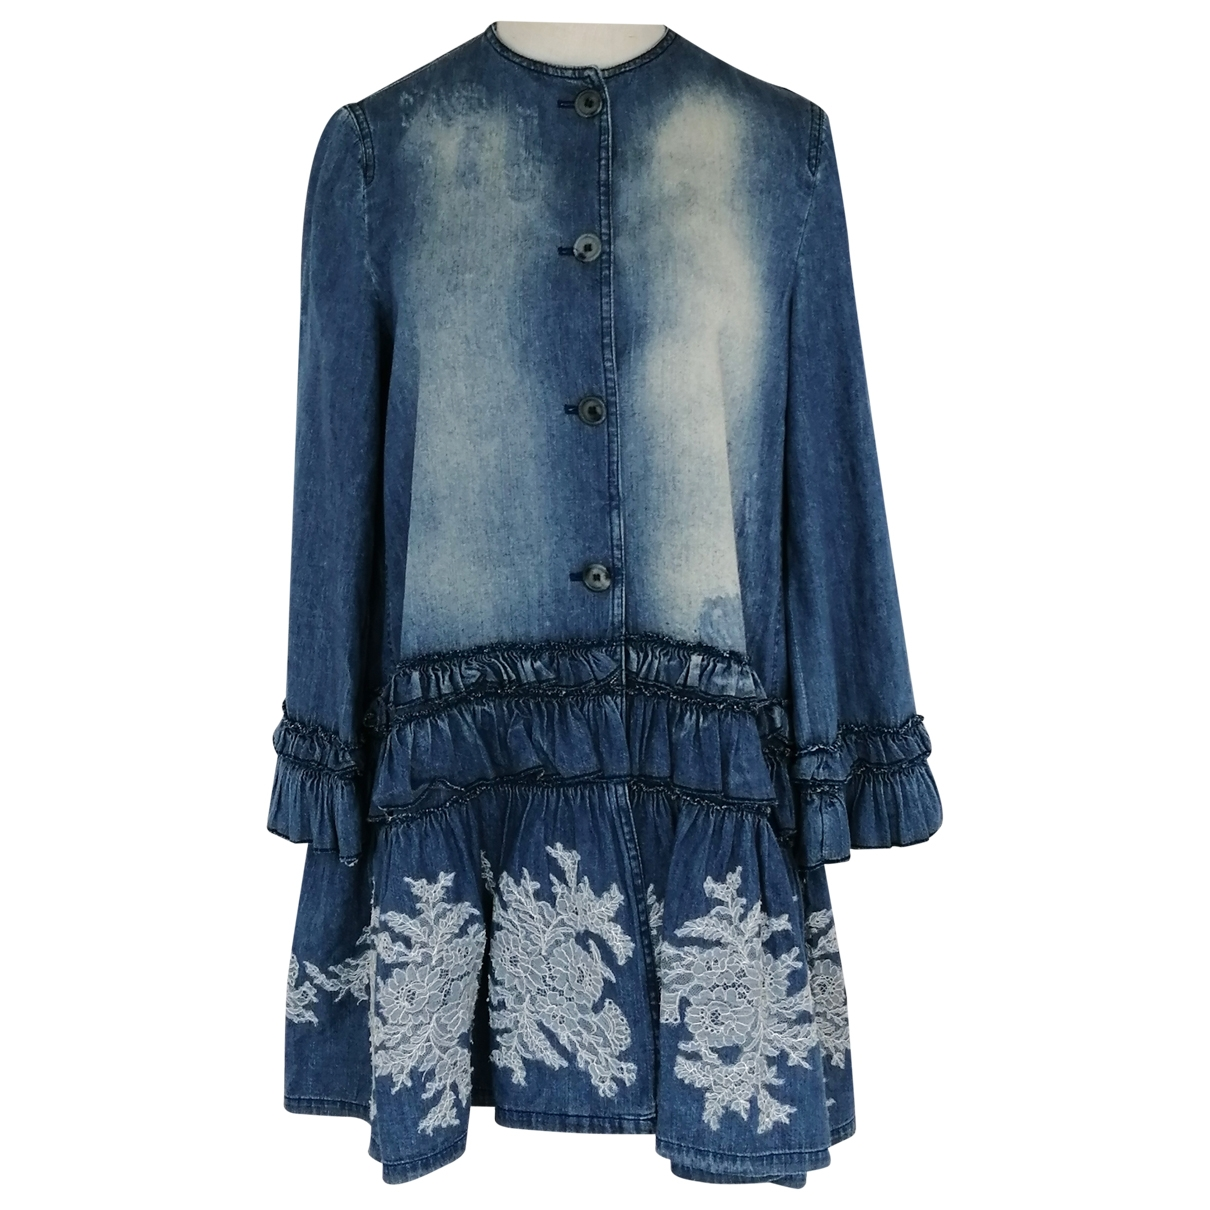 Ermanno Scervino \N Blue Cotton dress for Women 38 IT